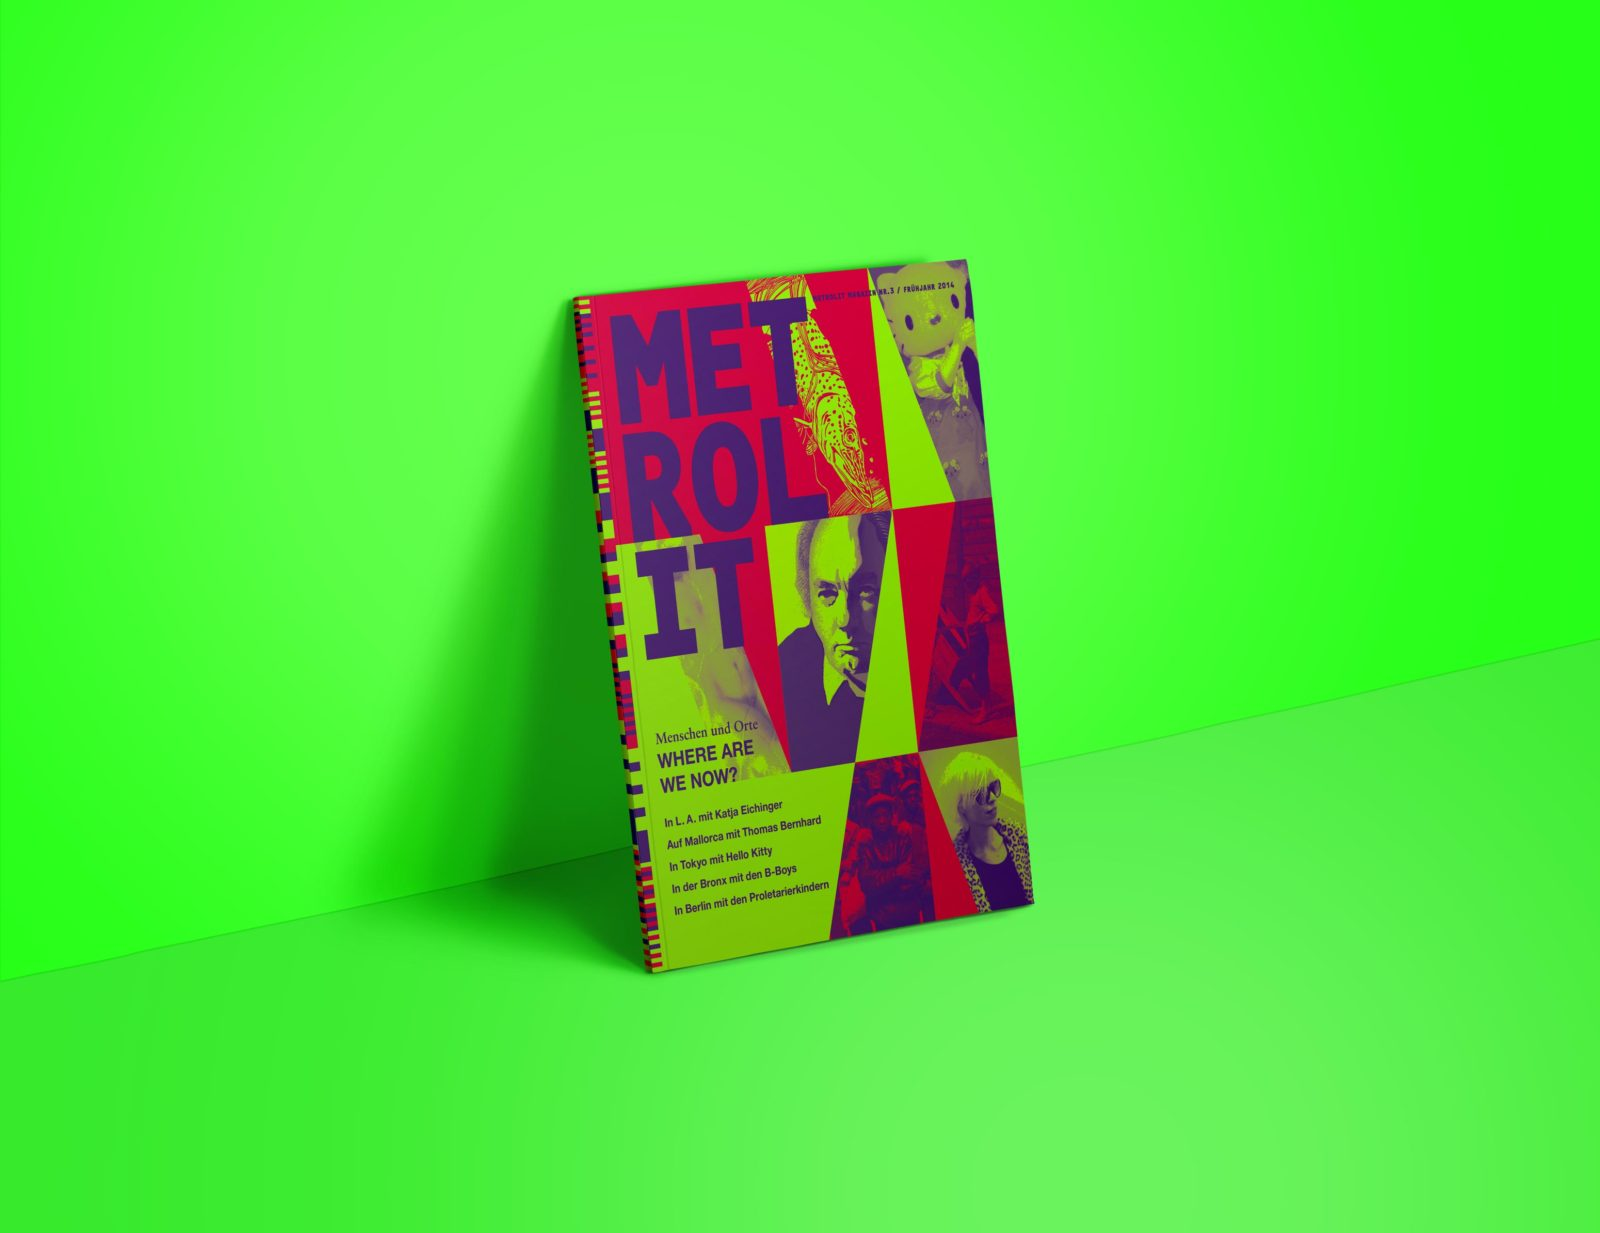 Editienne Grafikdesign - Kommunikationsdesign Berlin- Editorial Design Verlagskommunikation 13